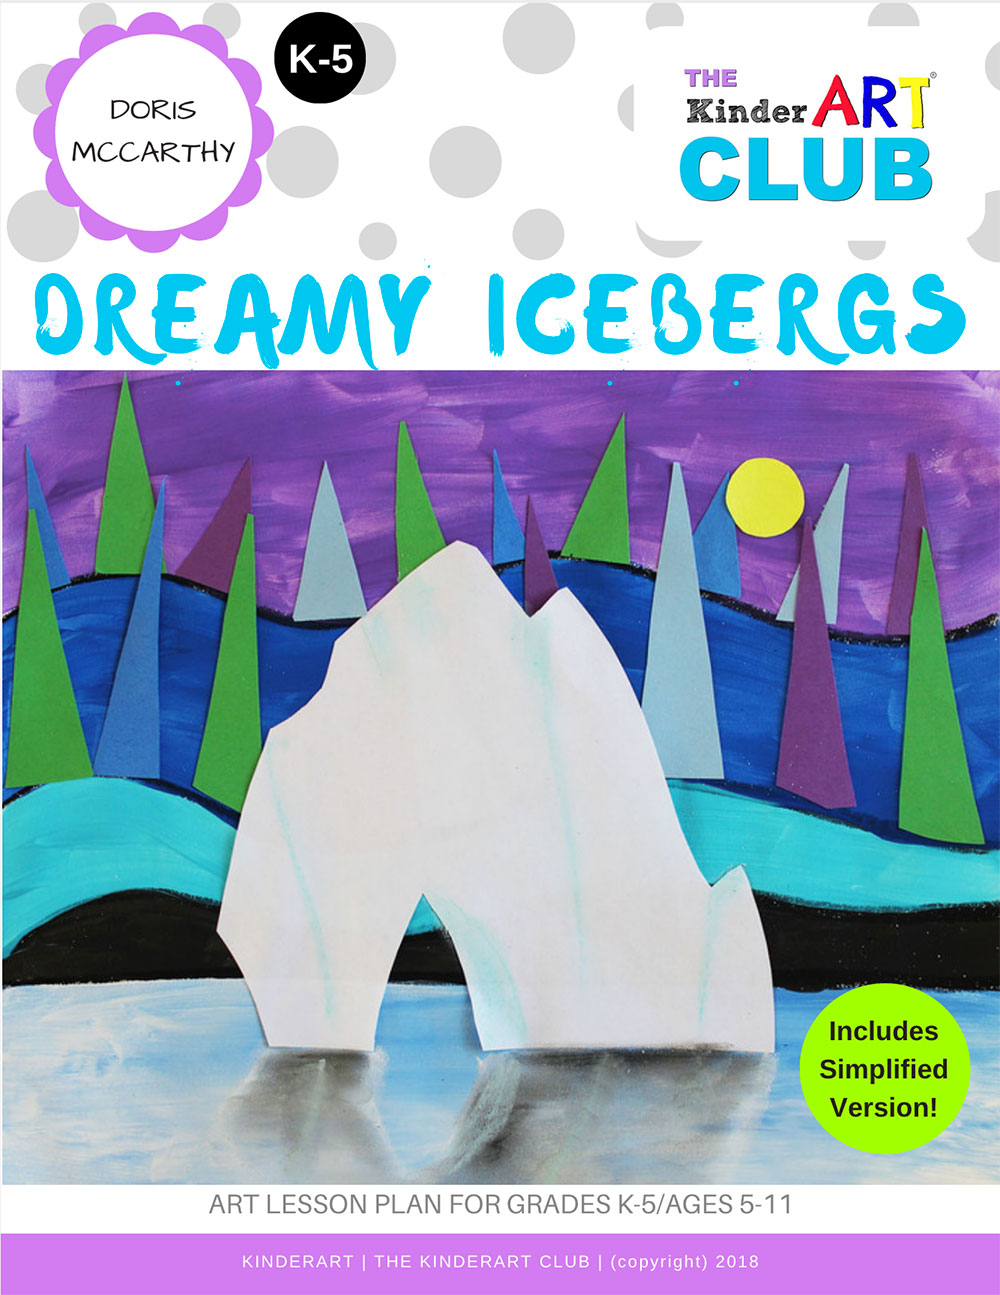 mccarthy_dreamy_icebergs